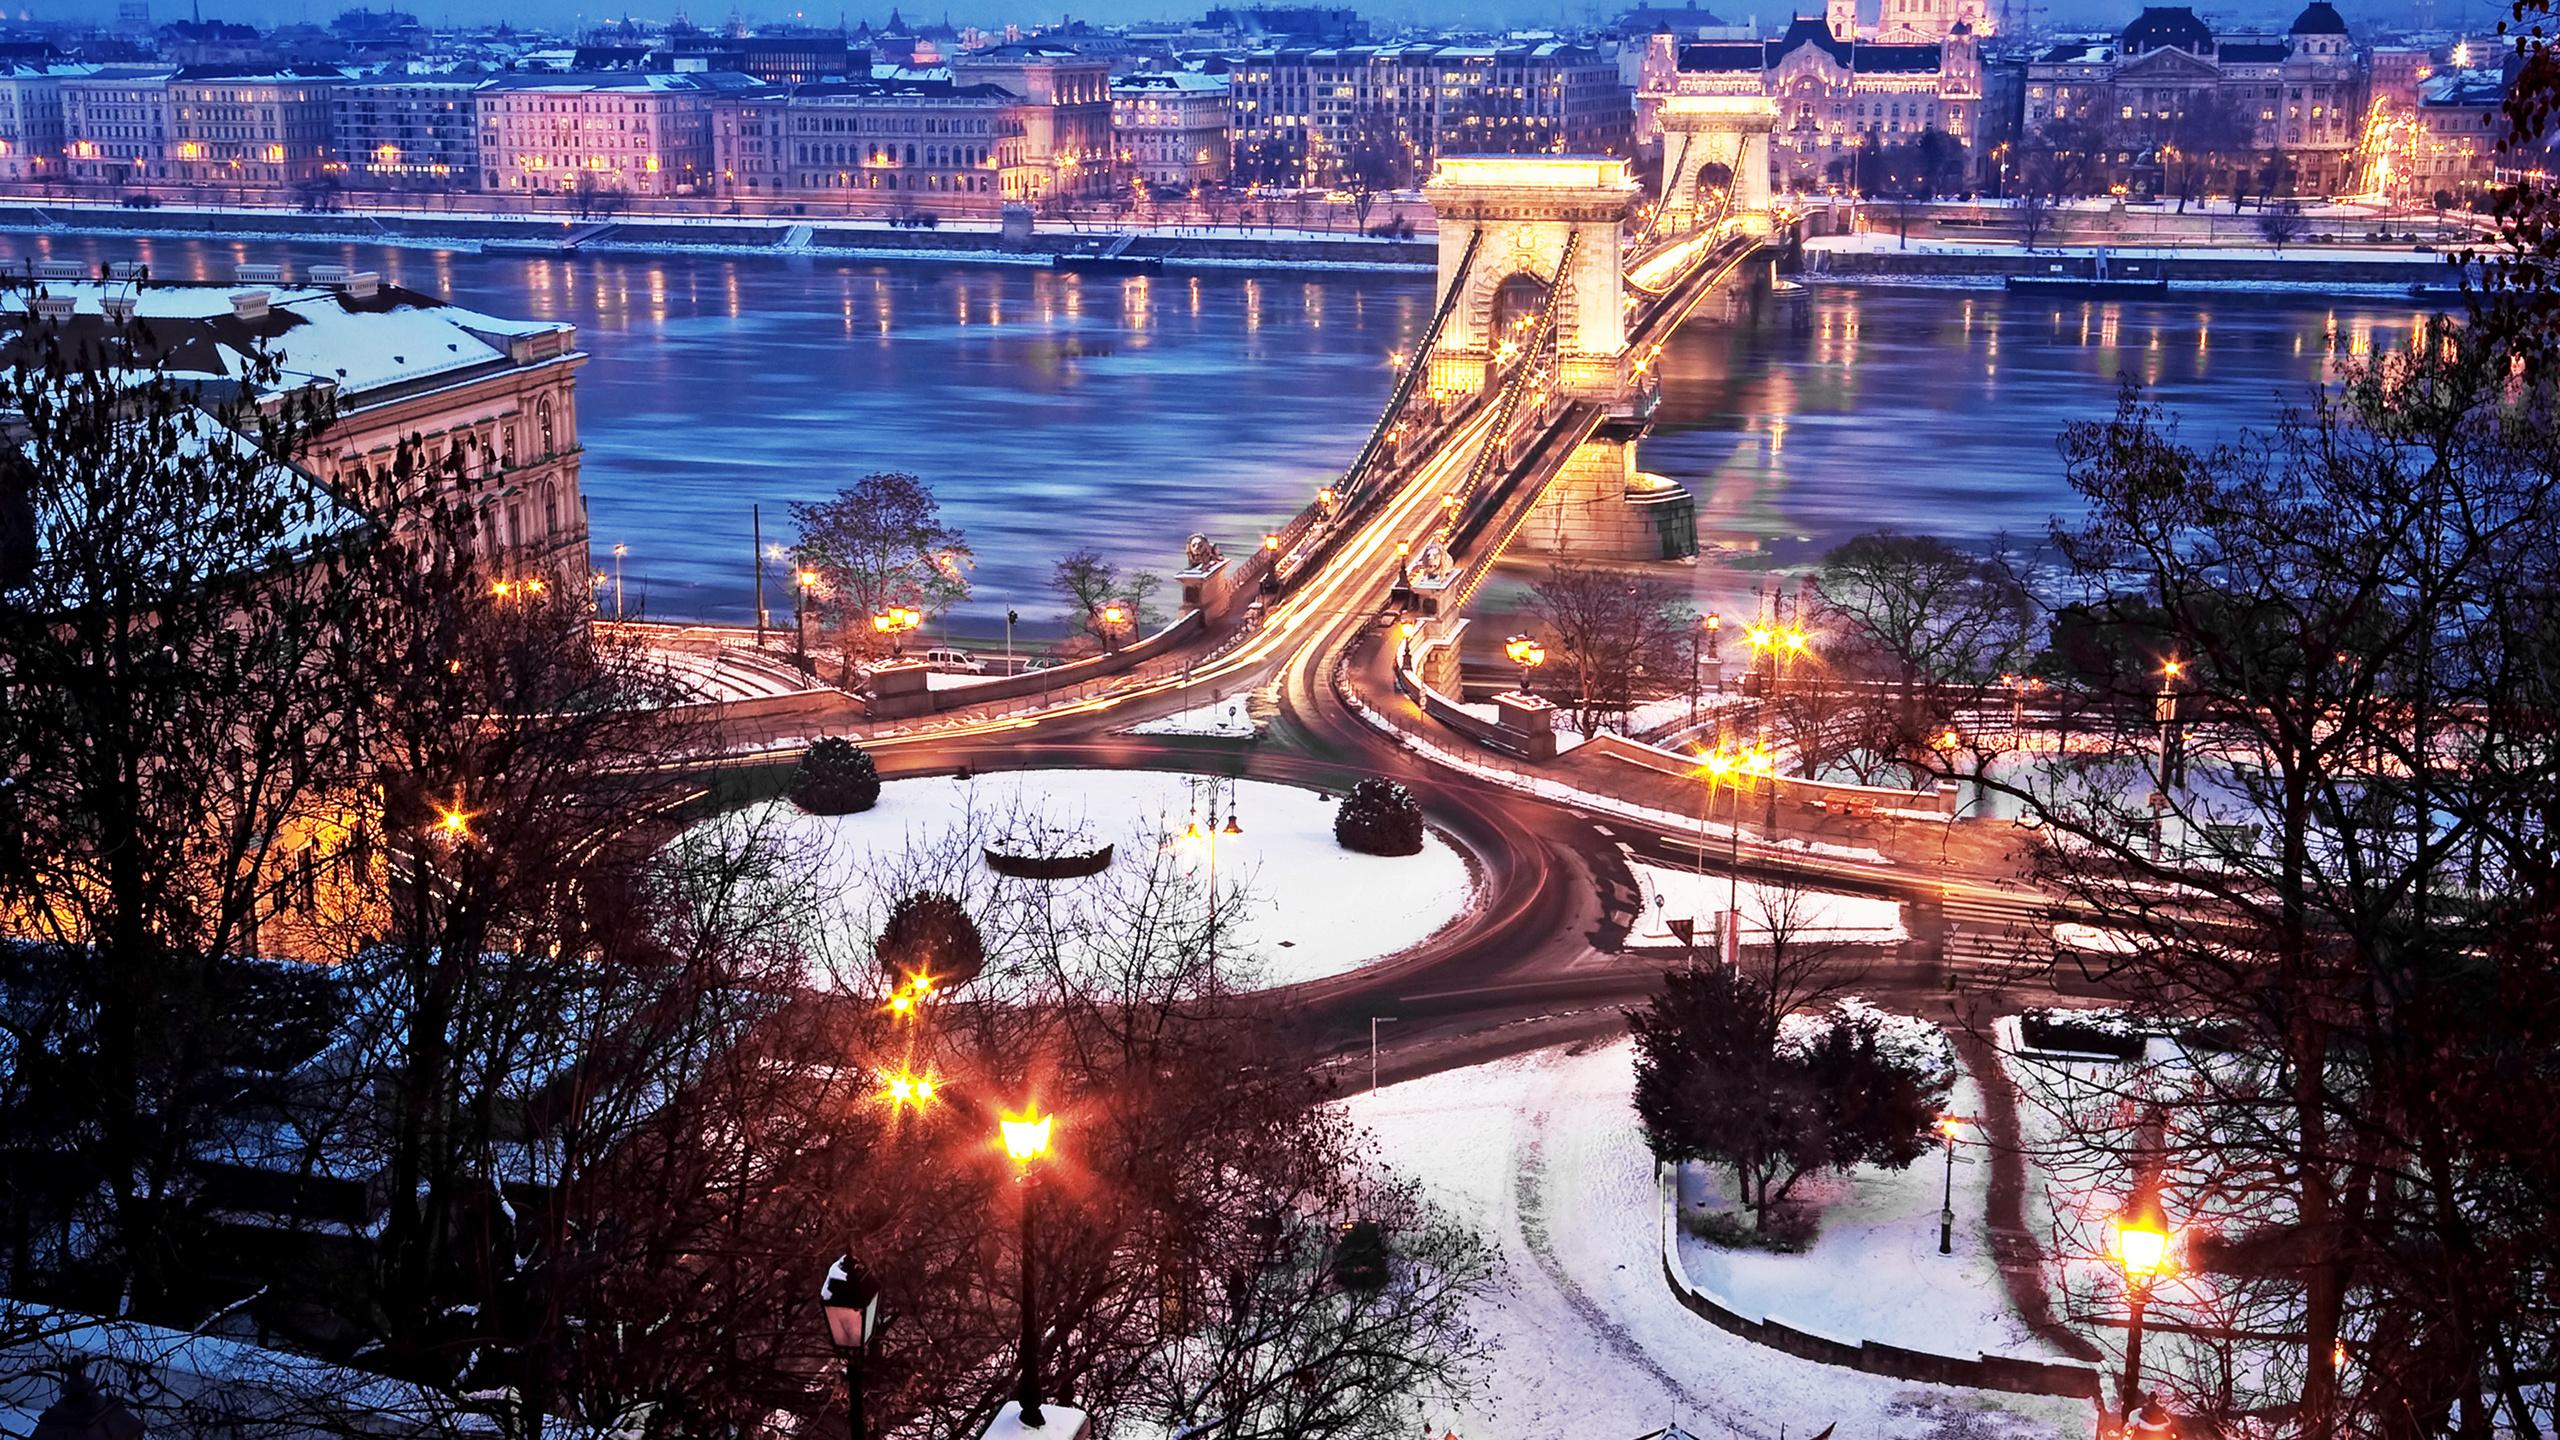 будапешт, мост, река, зима, город, здания, вечер